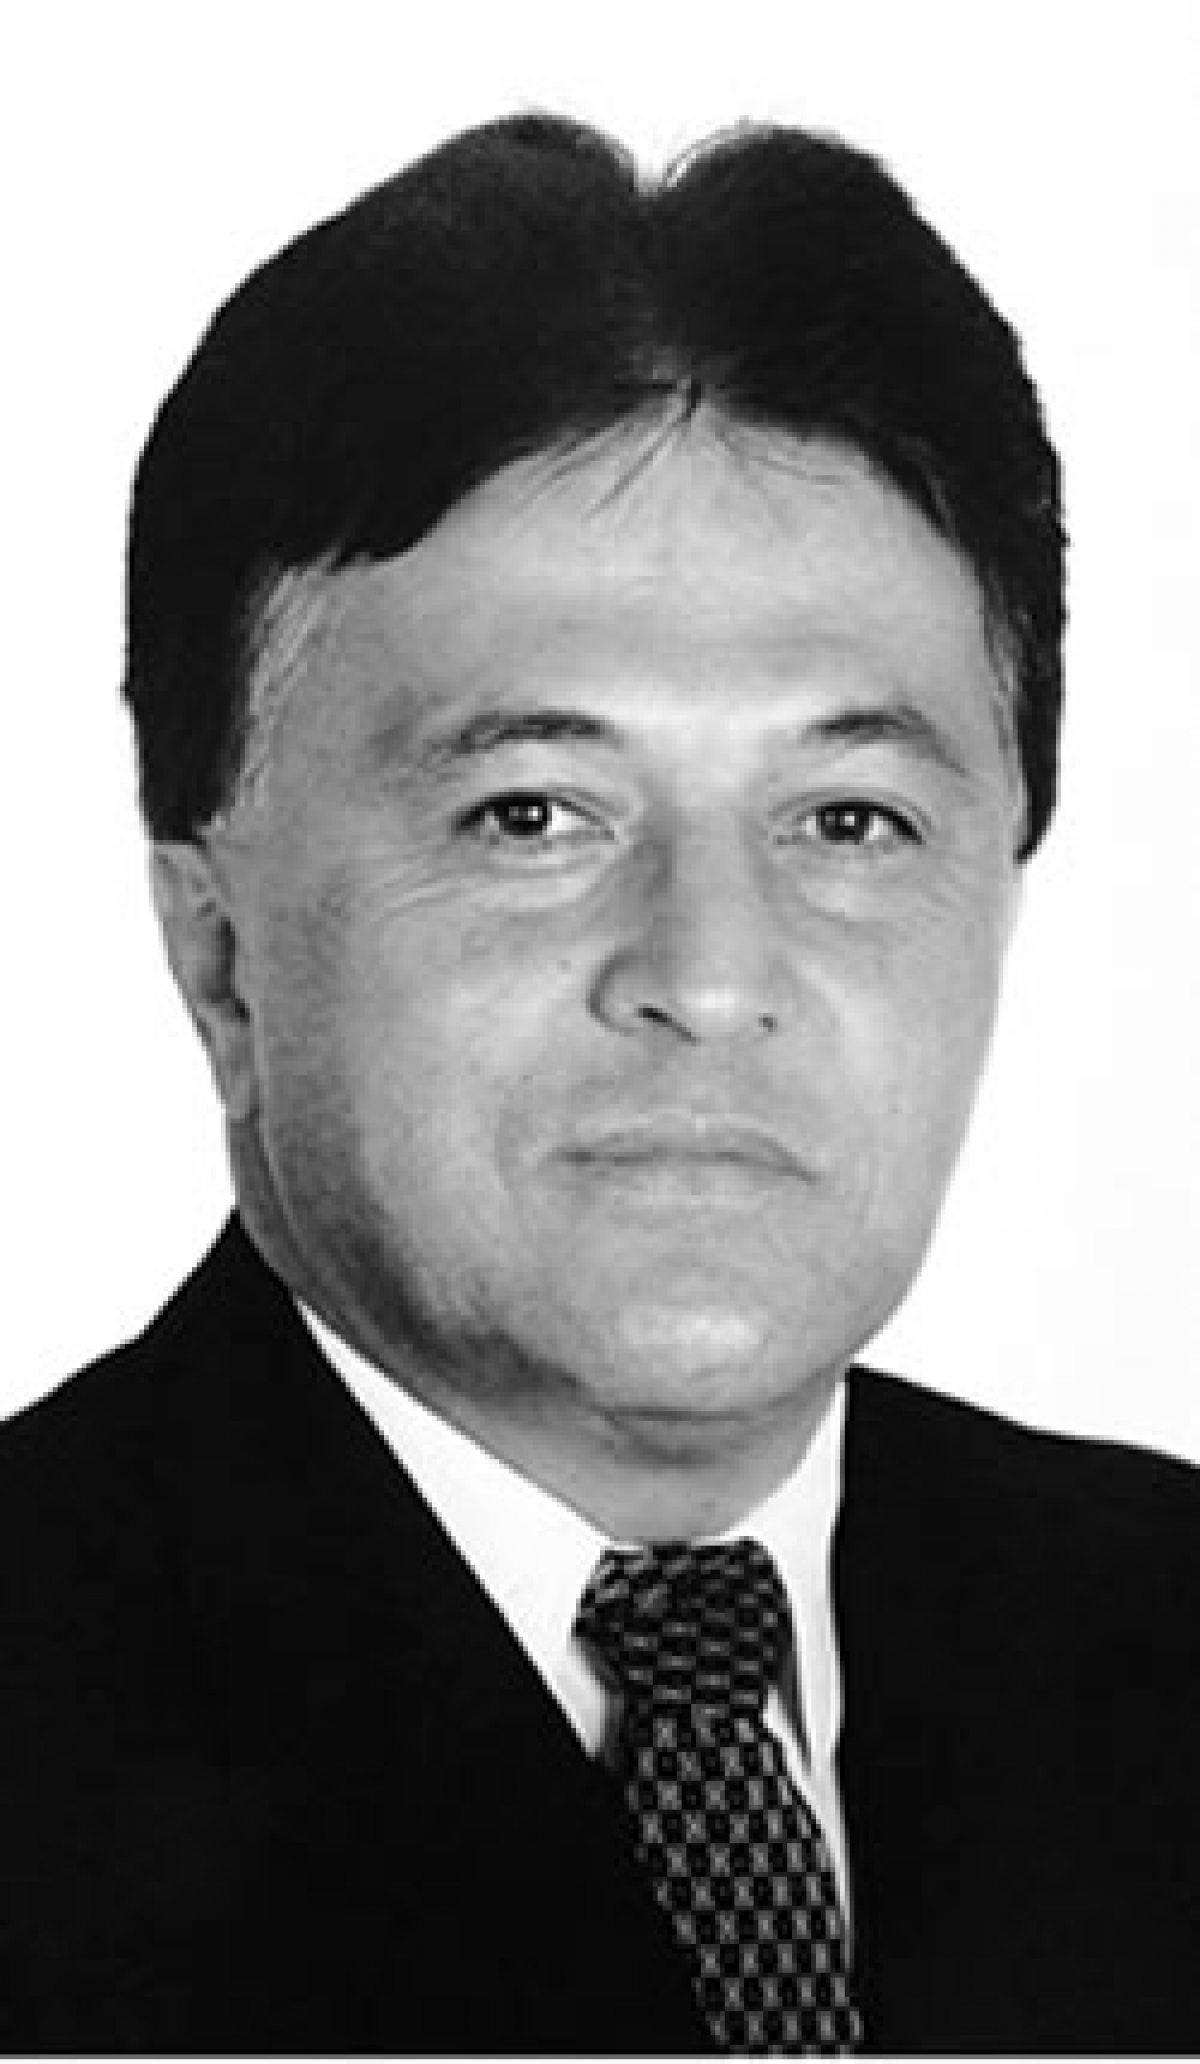 Luiz Divonsir <br> Shimoguiri